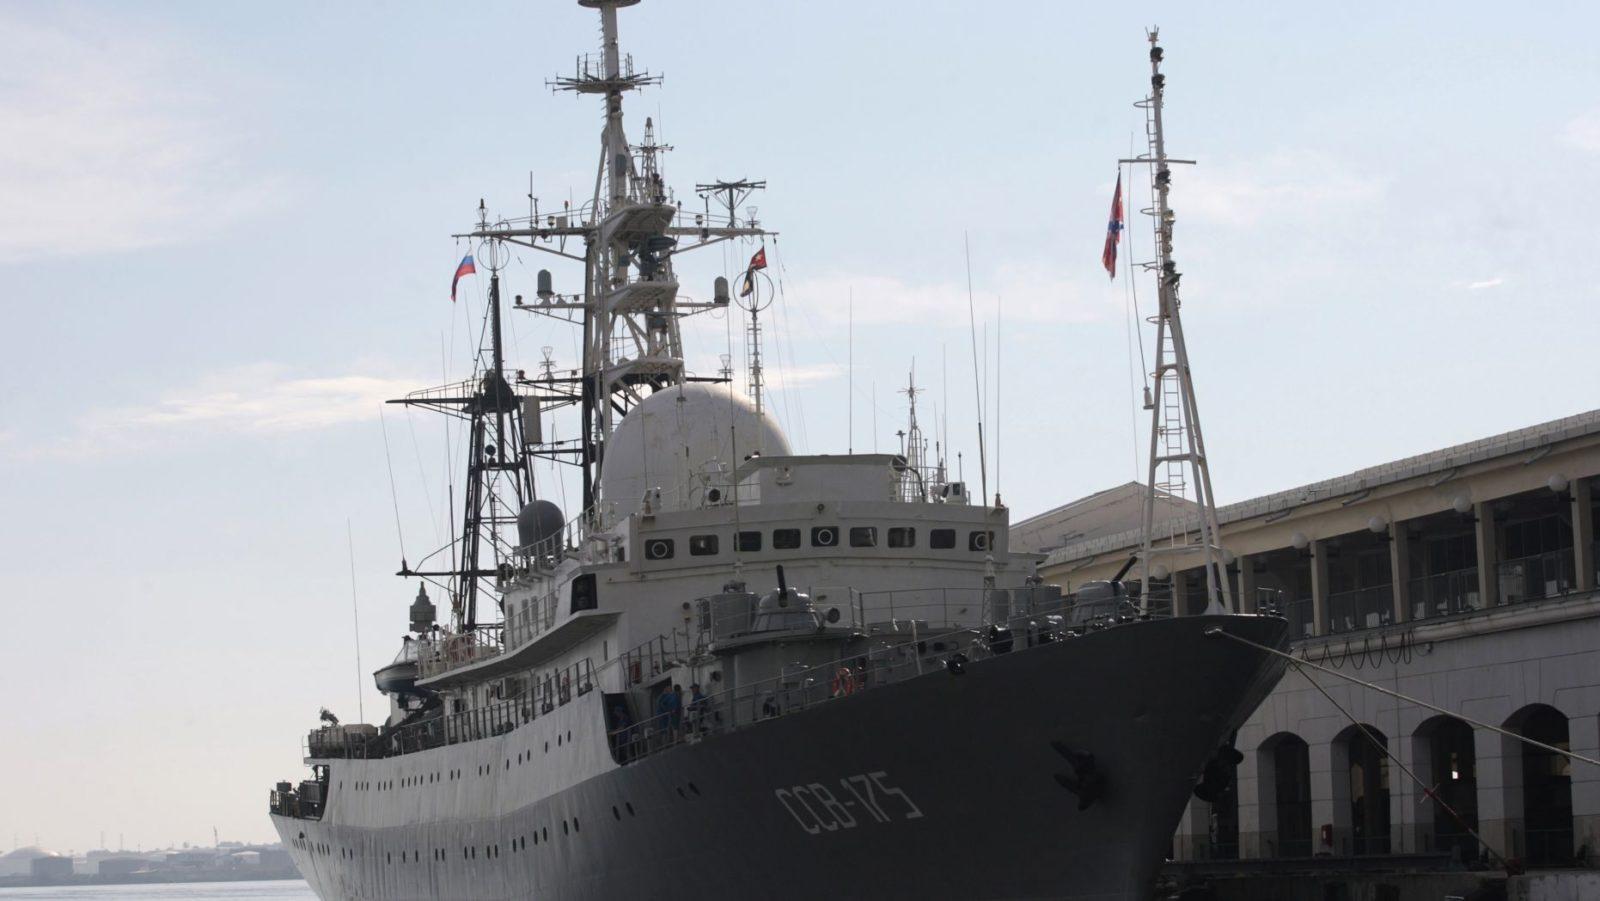 Fox News Today: Russian spy ship spotted off East Coast near US submarine fleet, Coast Guard warns